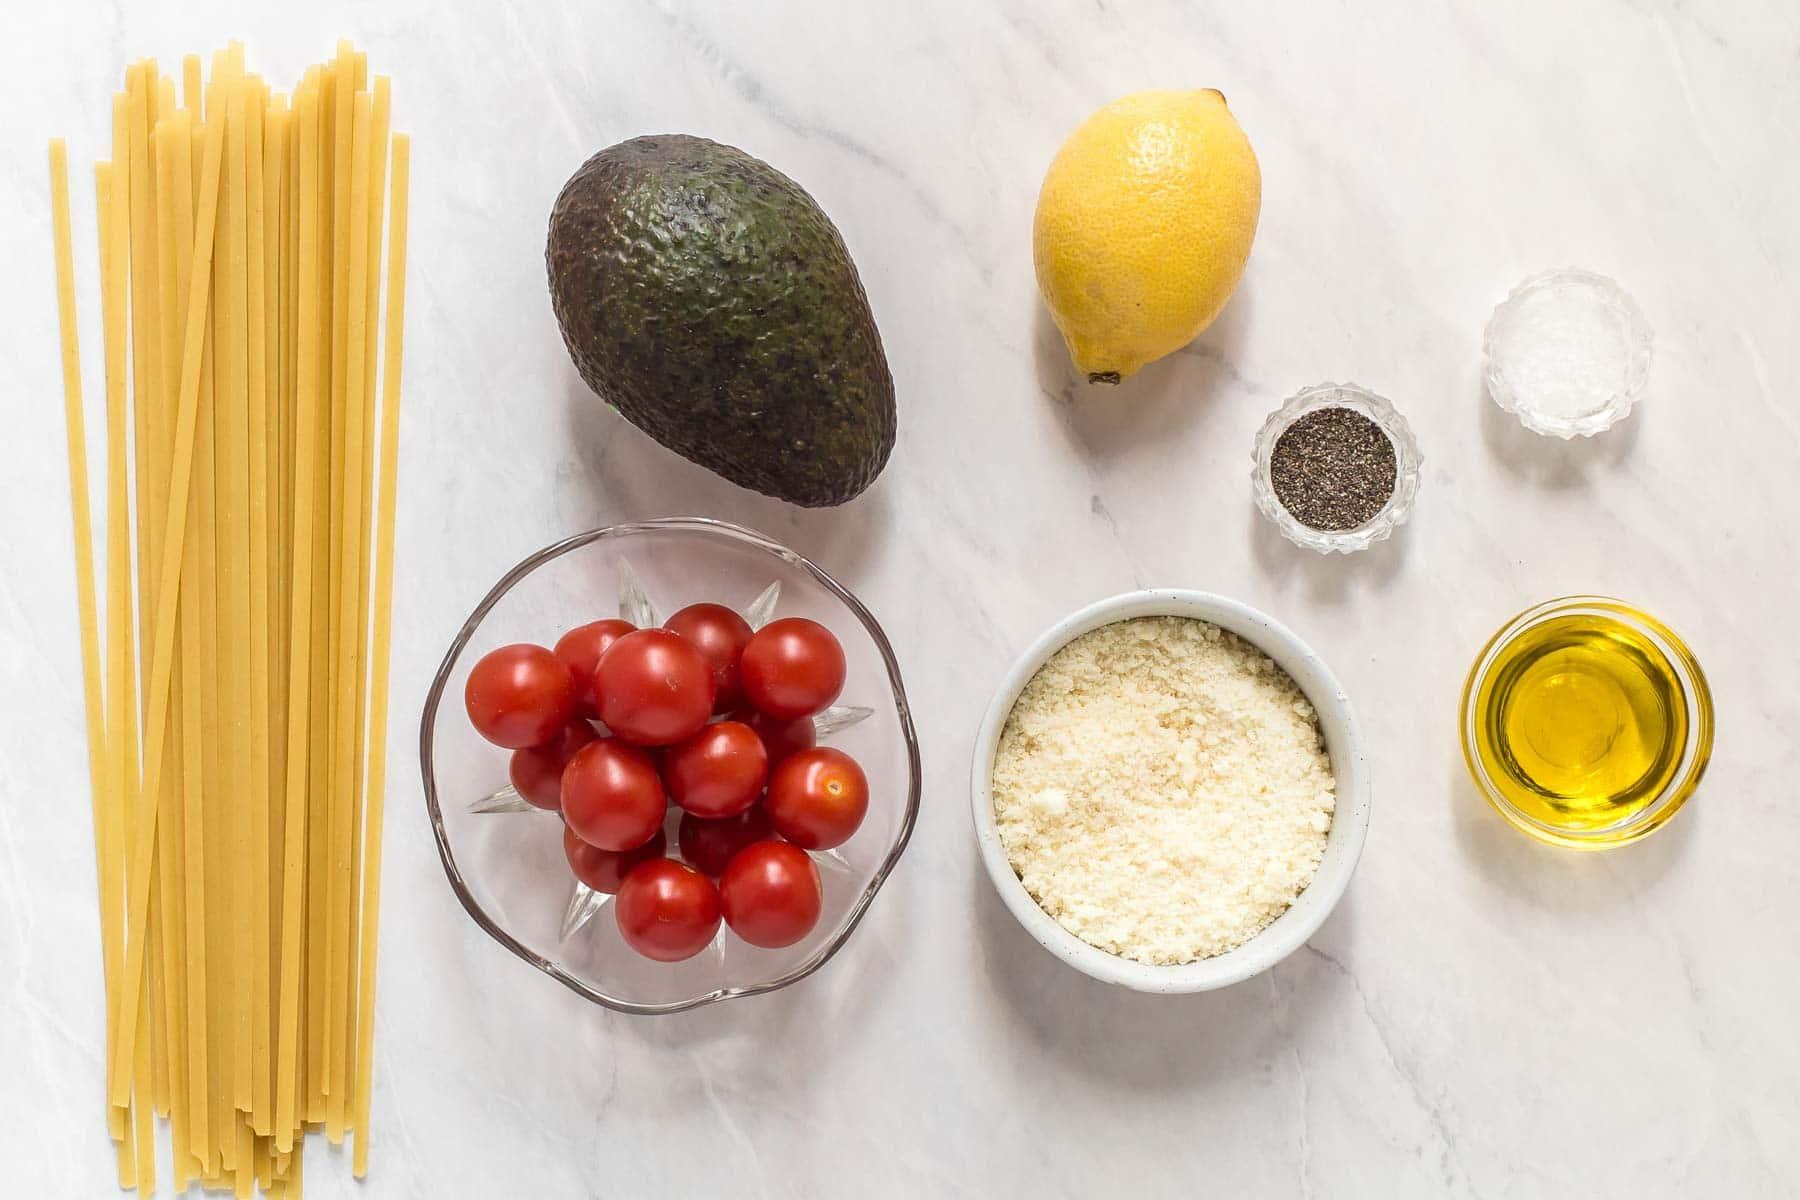 Ingredients for avocado pasta sauce on white table.